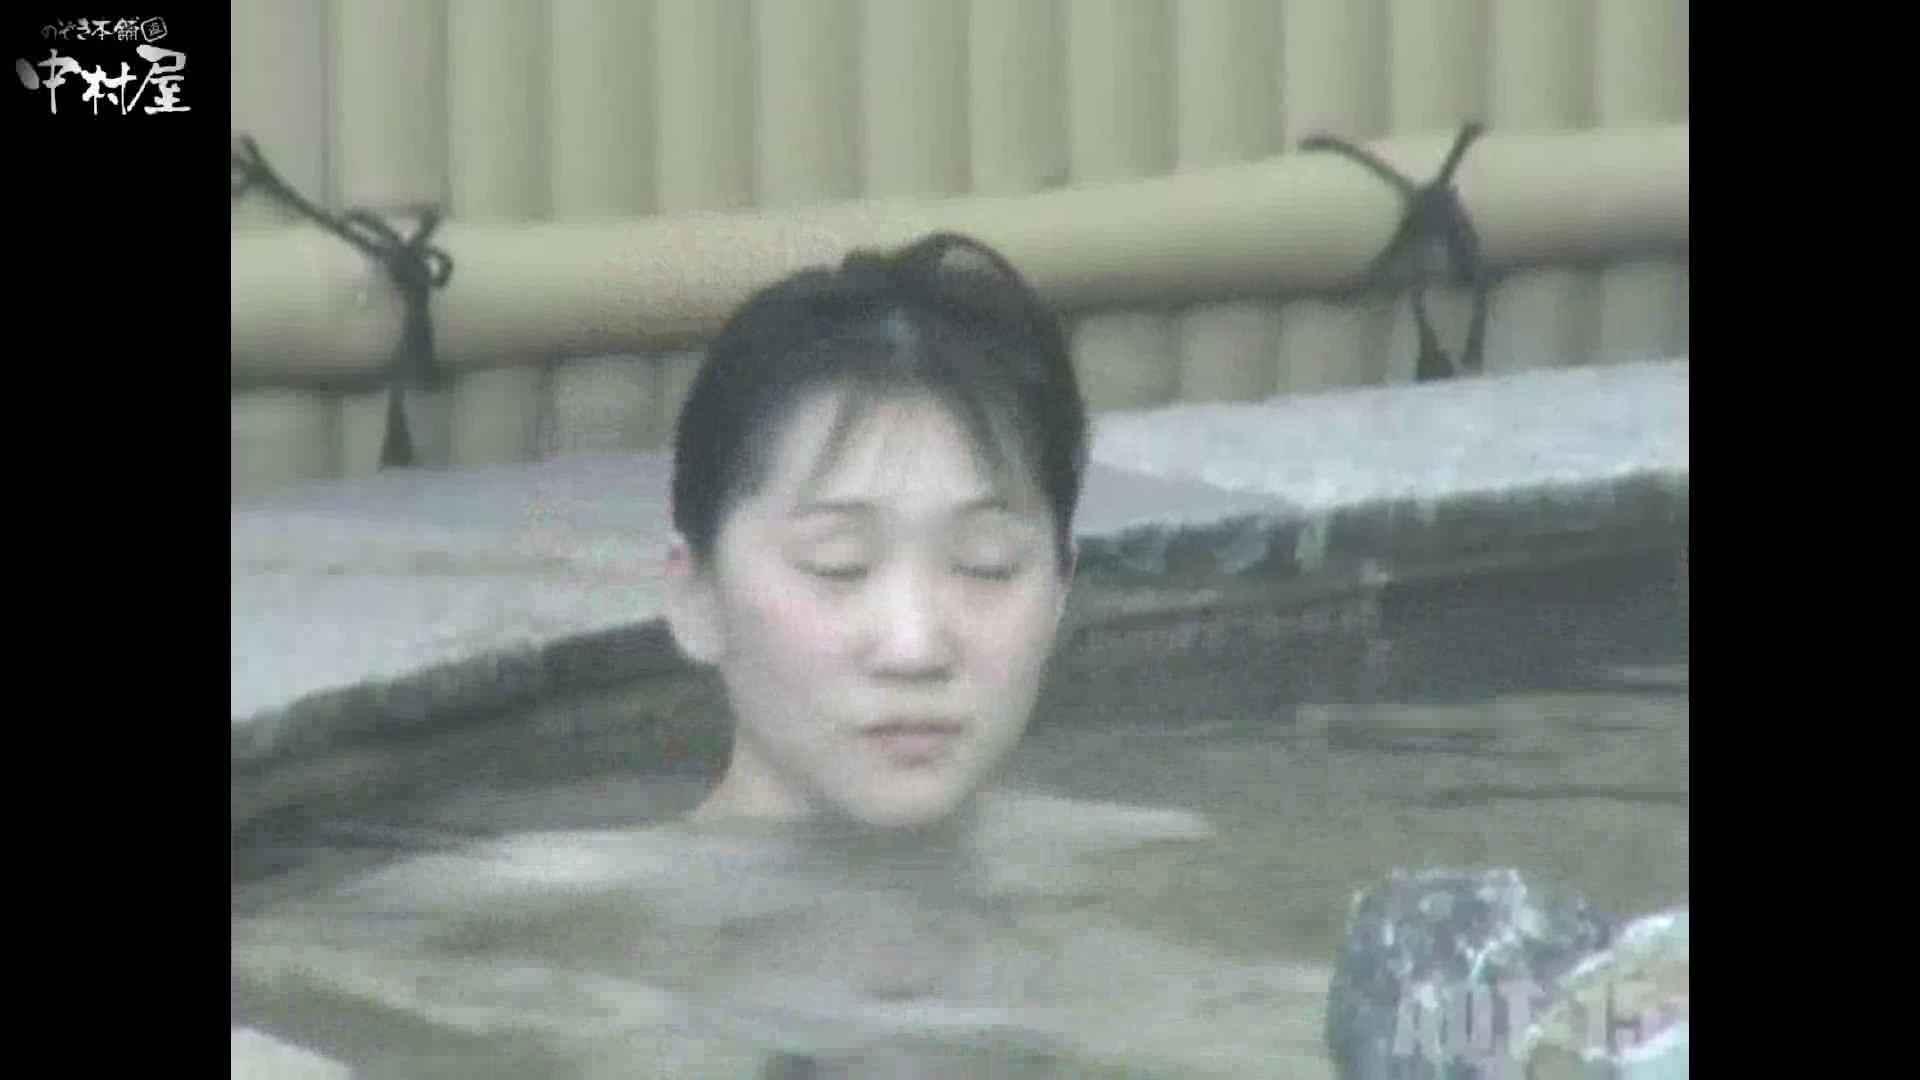 Aquaな露天風呂Vol.878潜入盗撮露天風呂十五判湯 其の一 いやらしいOL エロ無料画像 56連発 47